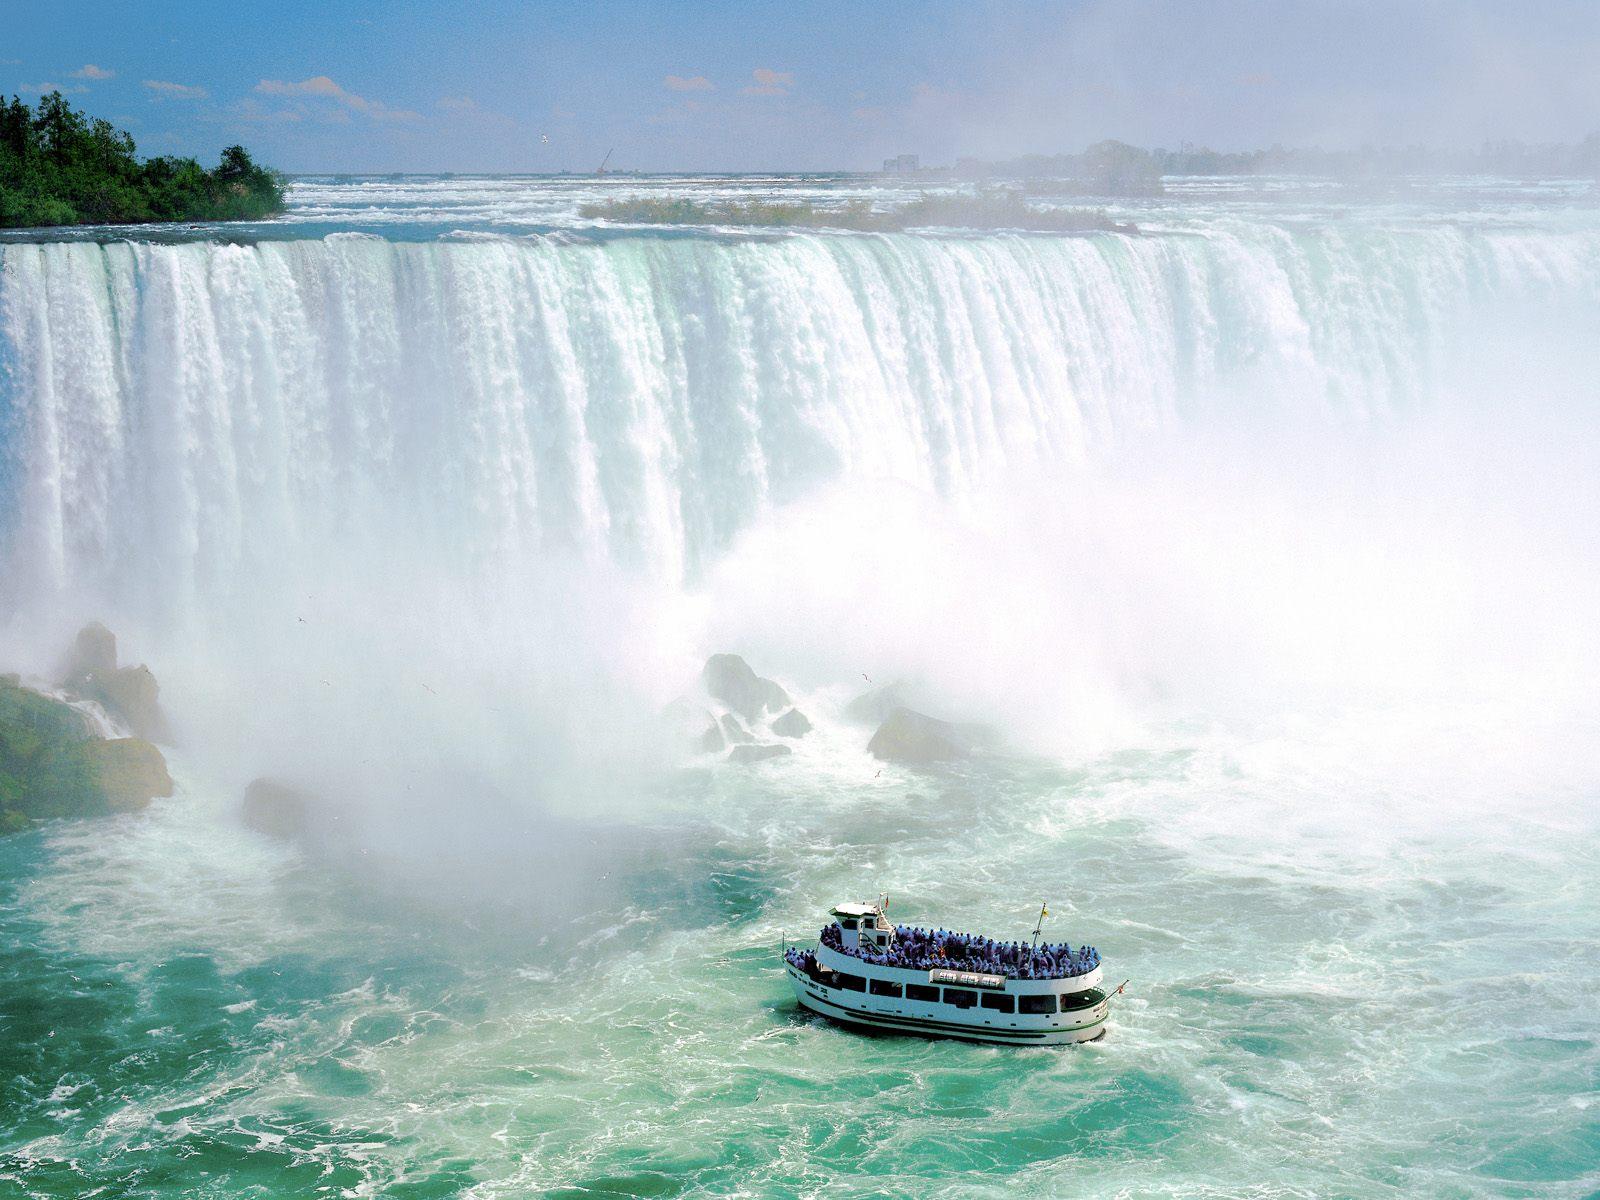 Maid Of The Mist VII Niagara Falls Ontario Canada